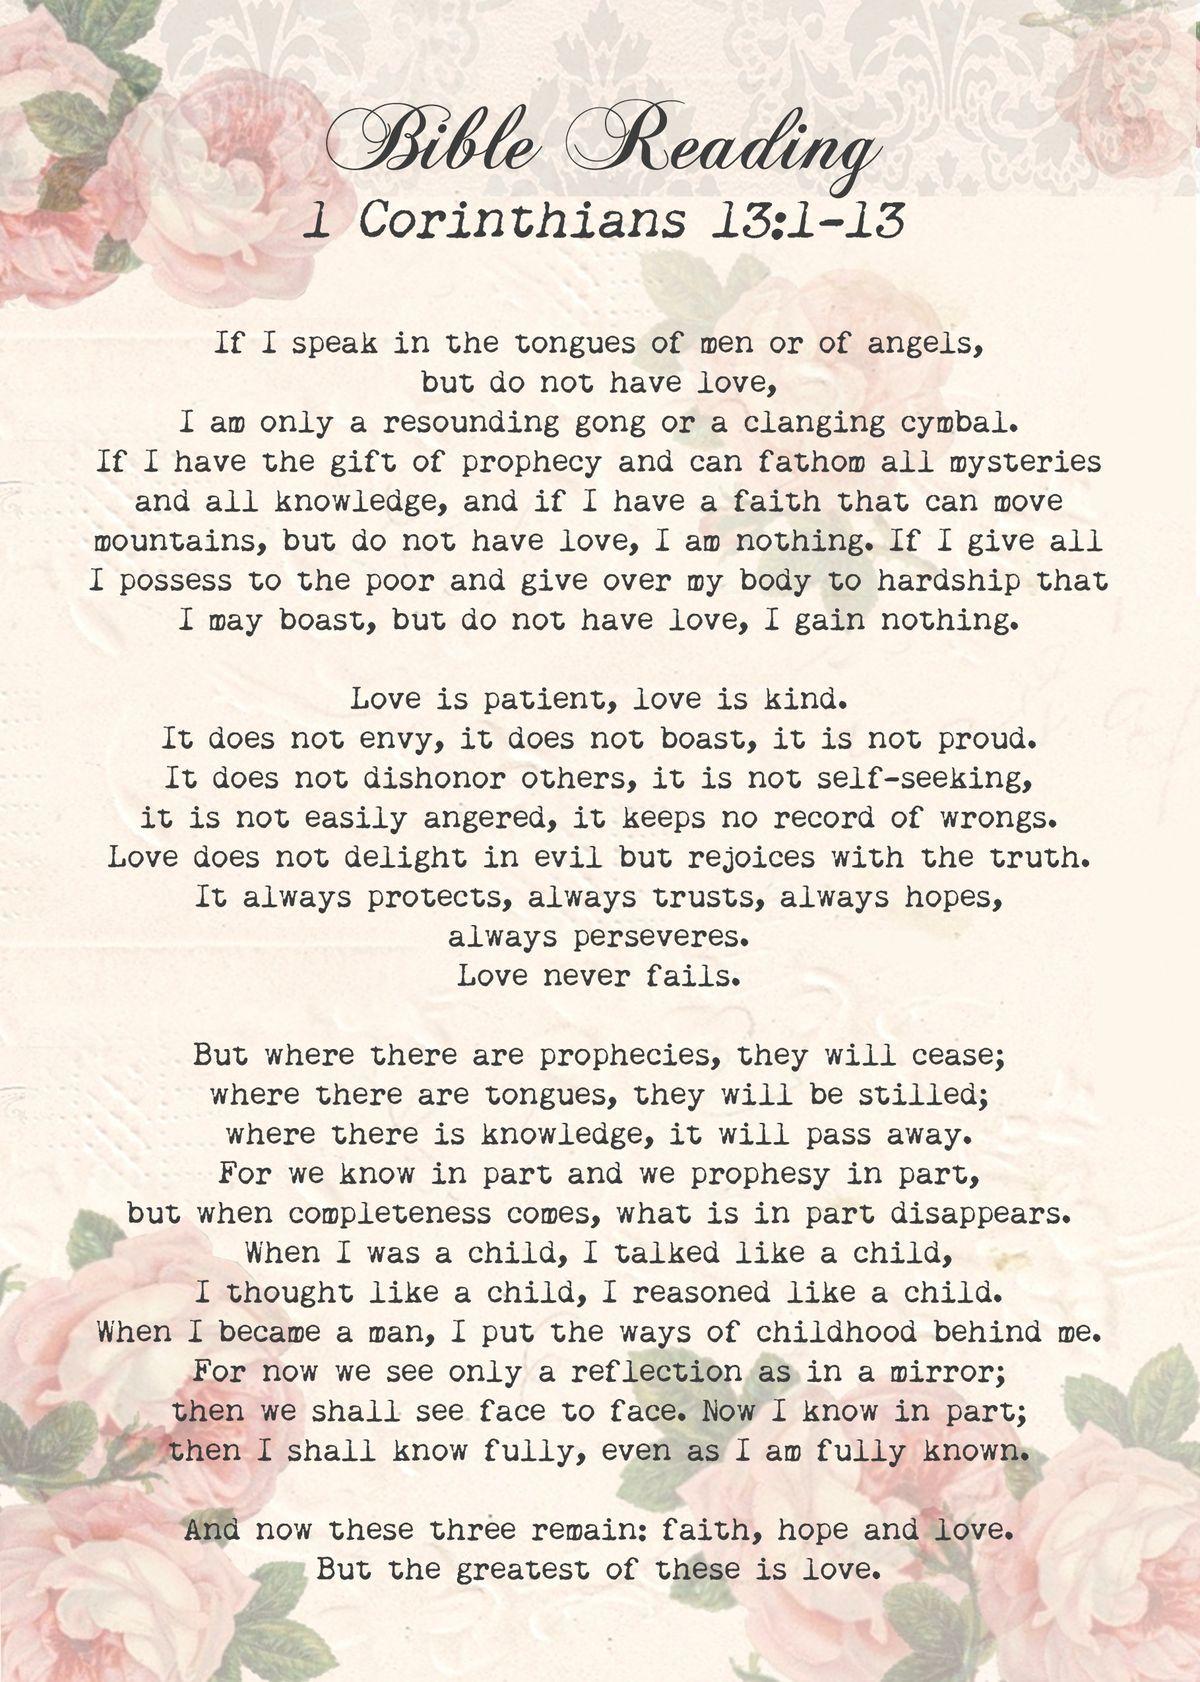 0e93b9d1dc7706e96130c966e62a3751 Jpg 1 200 682 Pixels Wedding Readings Scripture Poems